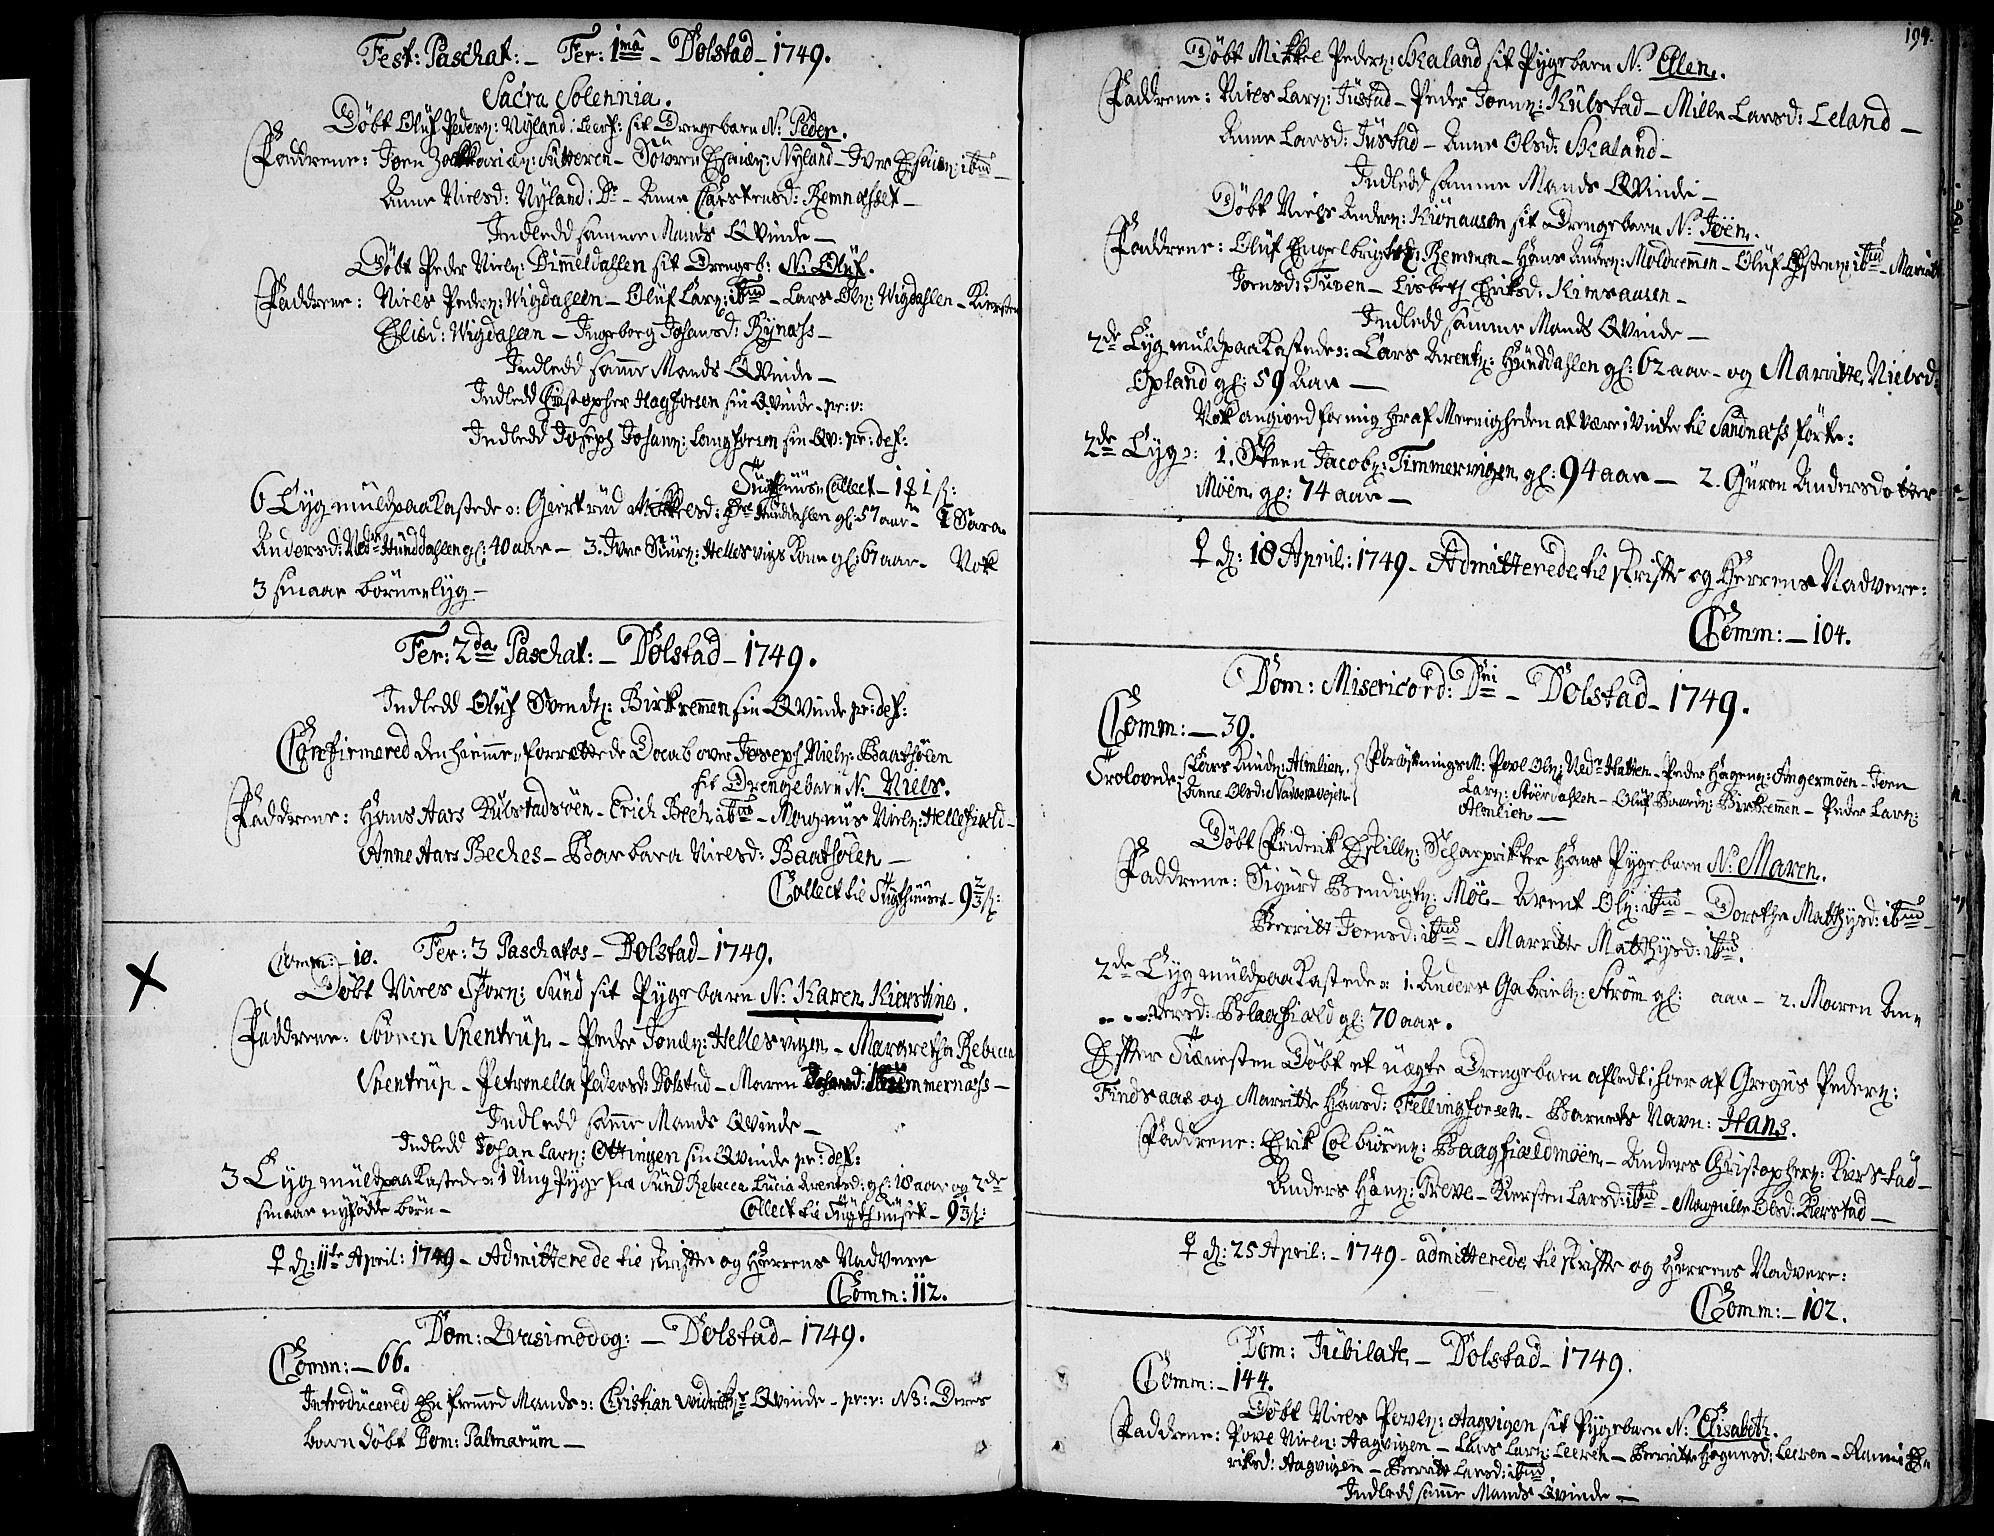 SAT, Ministerialprotokoller, klokkerbøker og fødselsregistre - Nordland, 820/L0284: Ministerialbok nr. 820A05, 1730-1752, s. 194